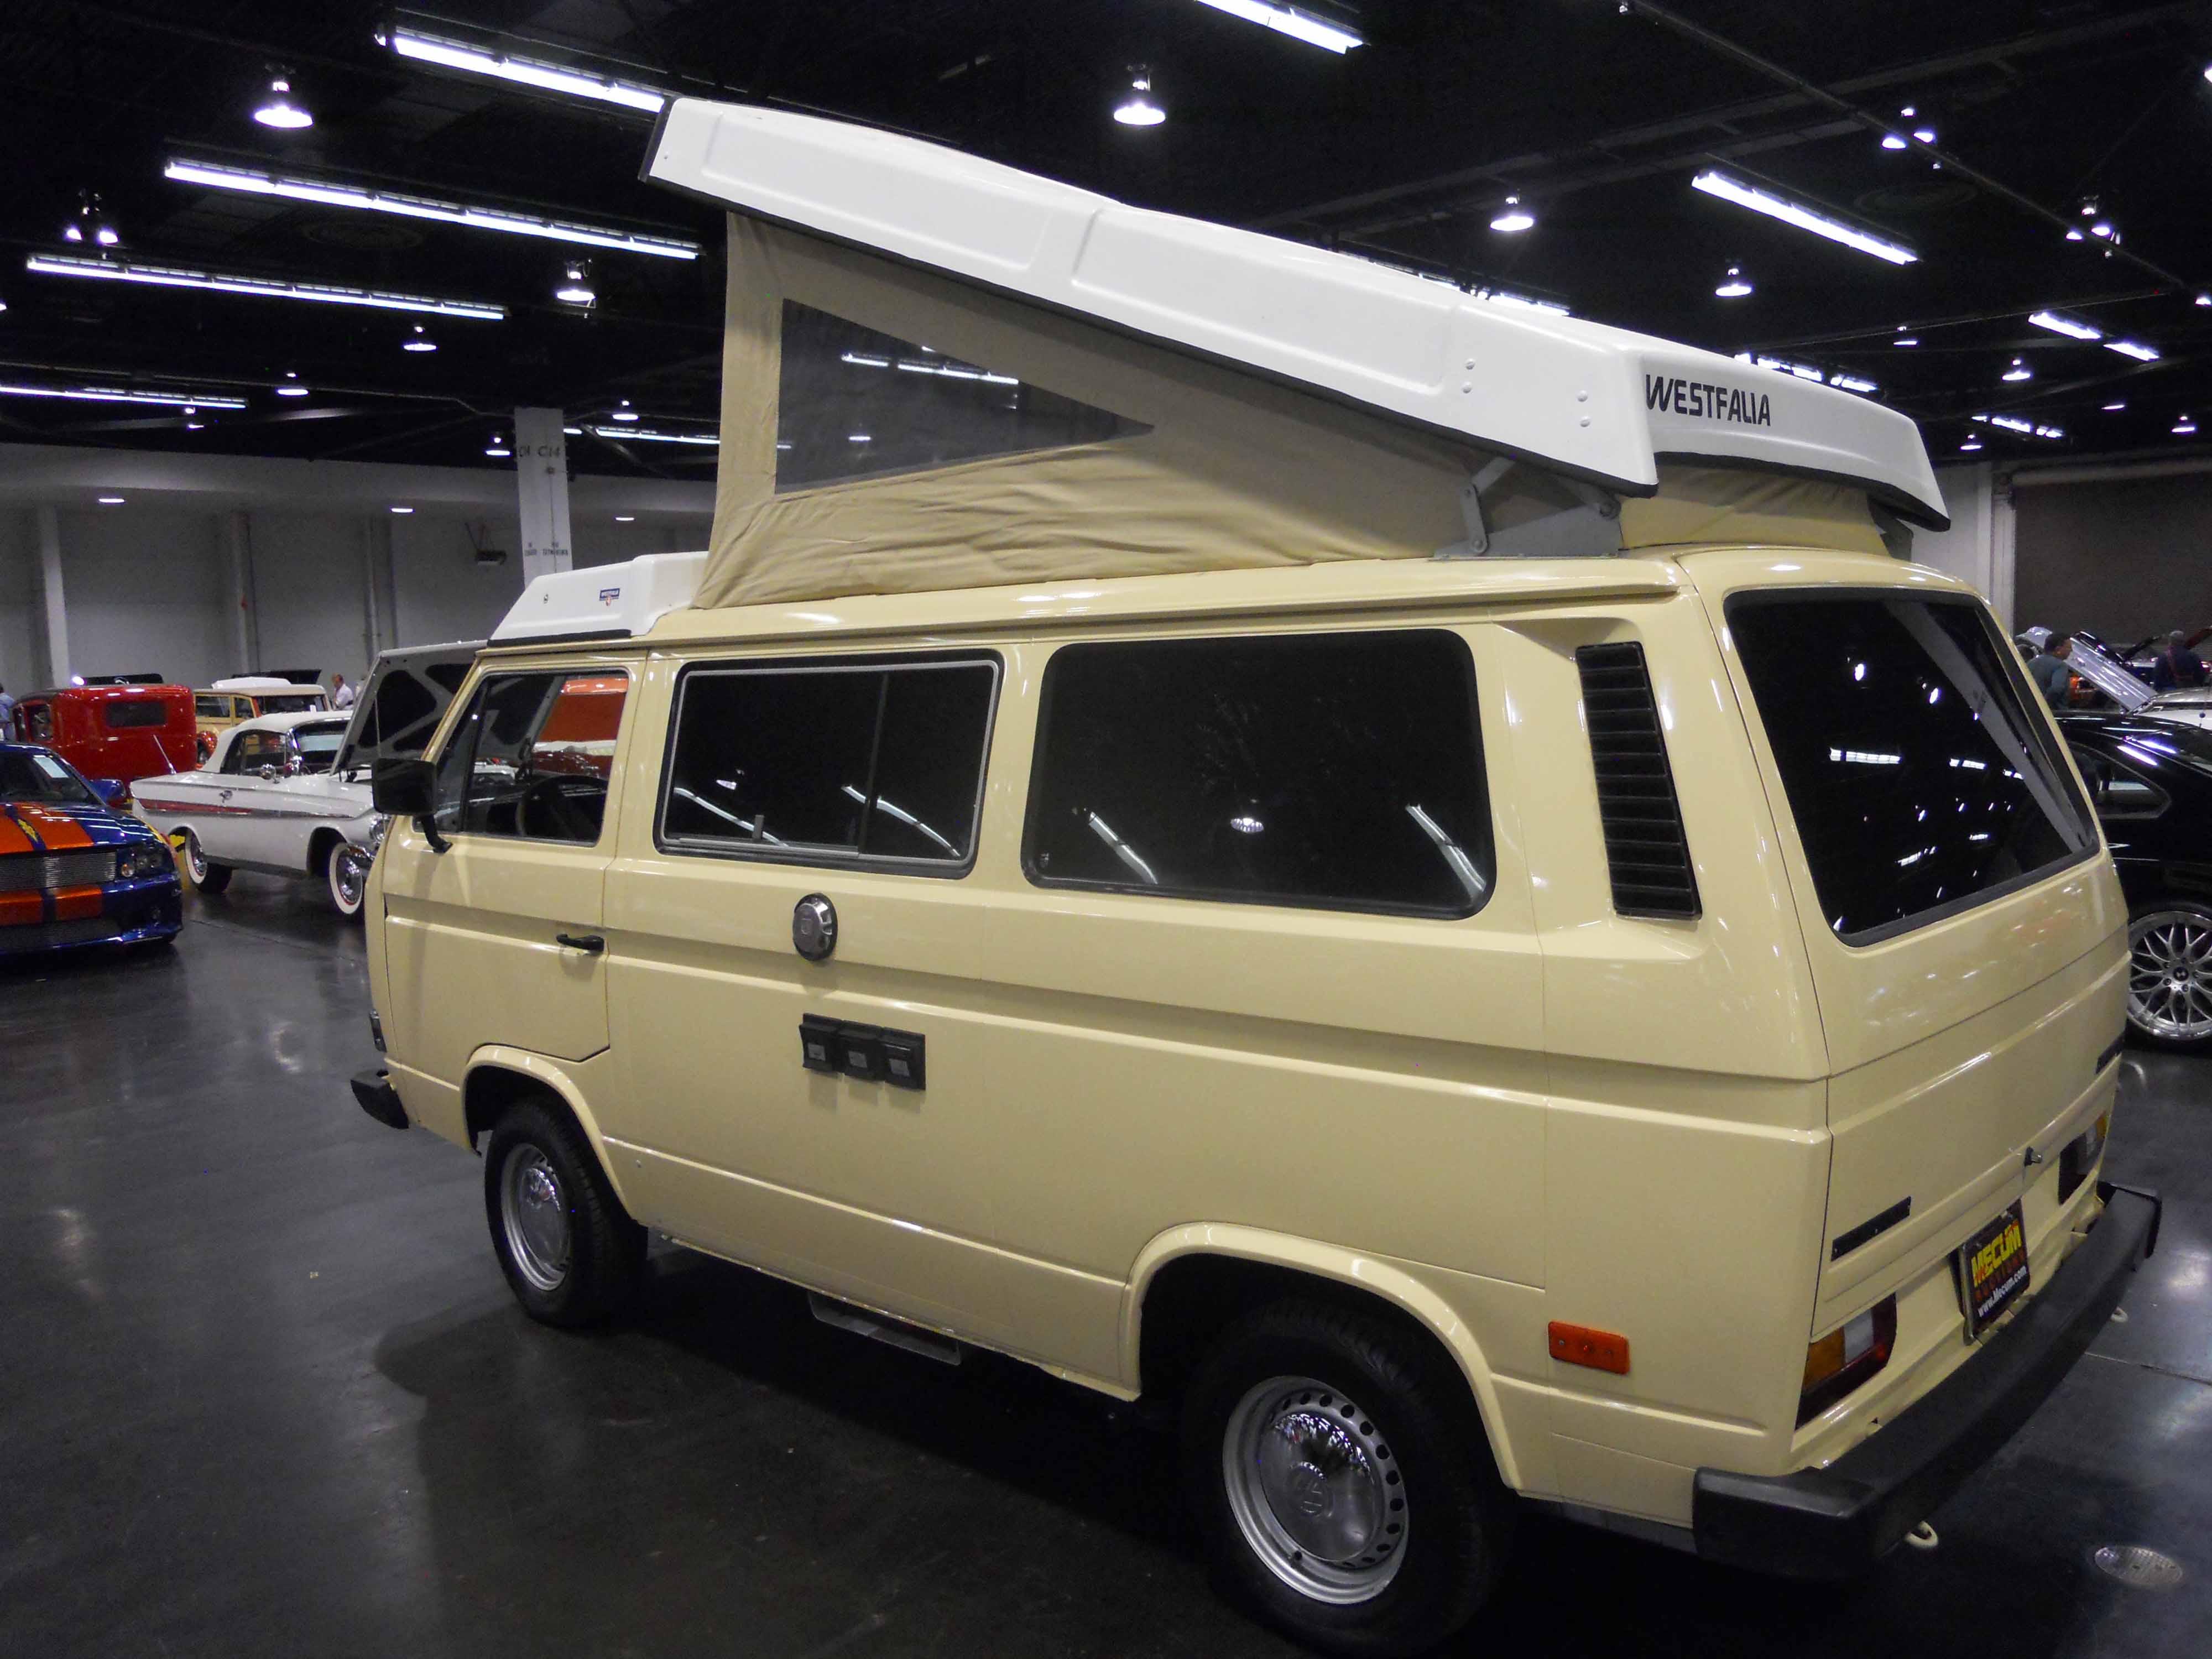 Volkswagen vanagon original paint color sample of ivory l567 sales code b9